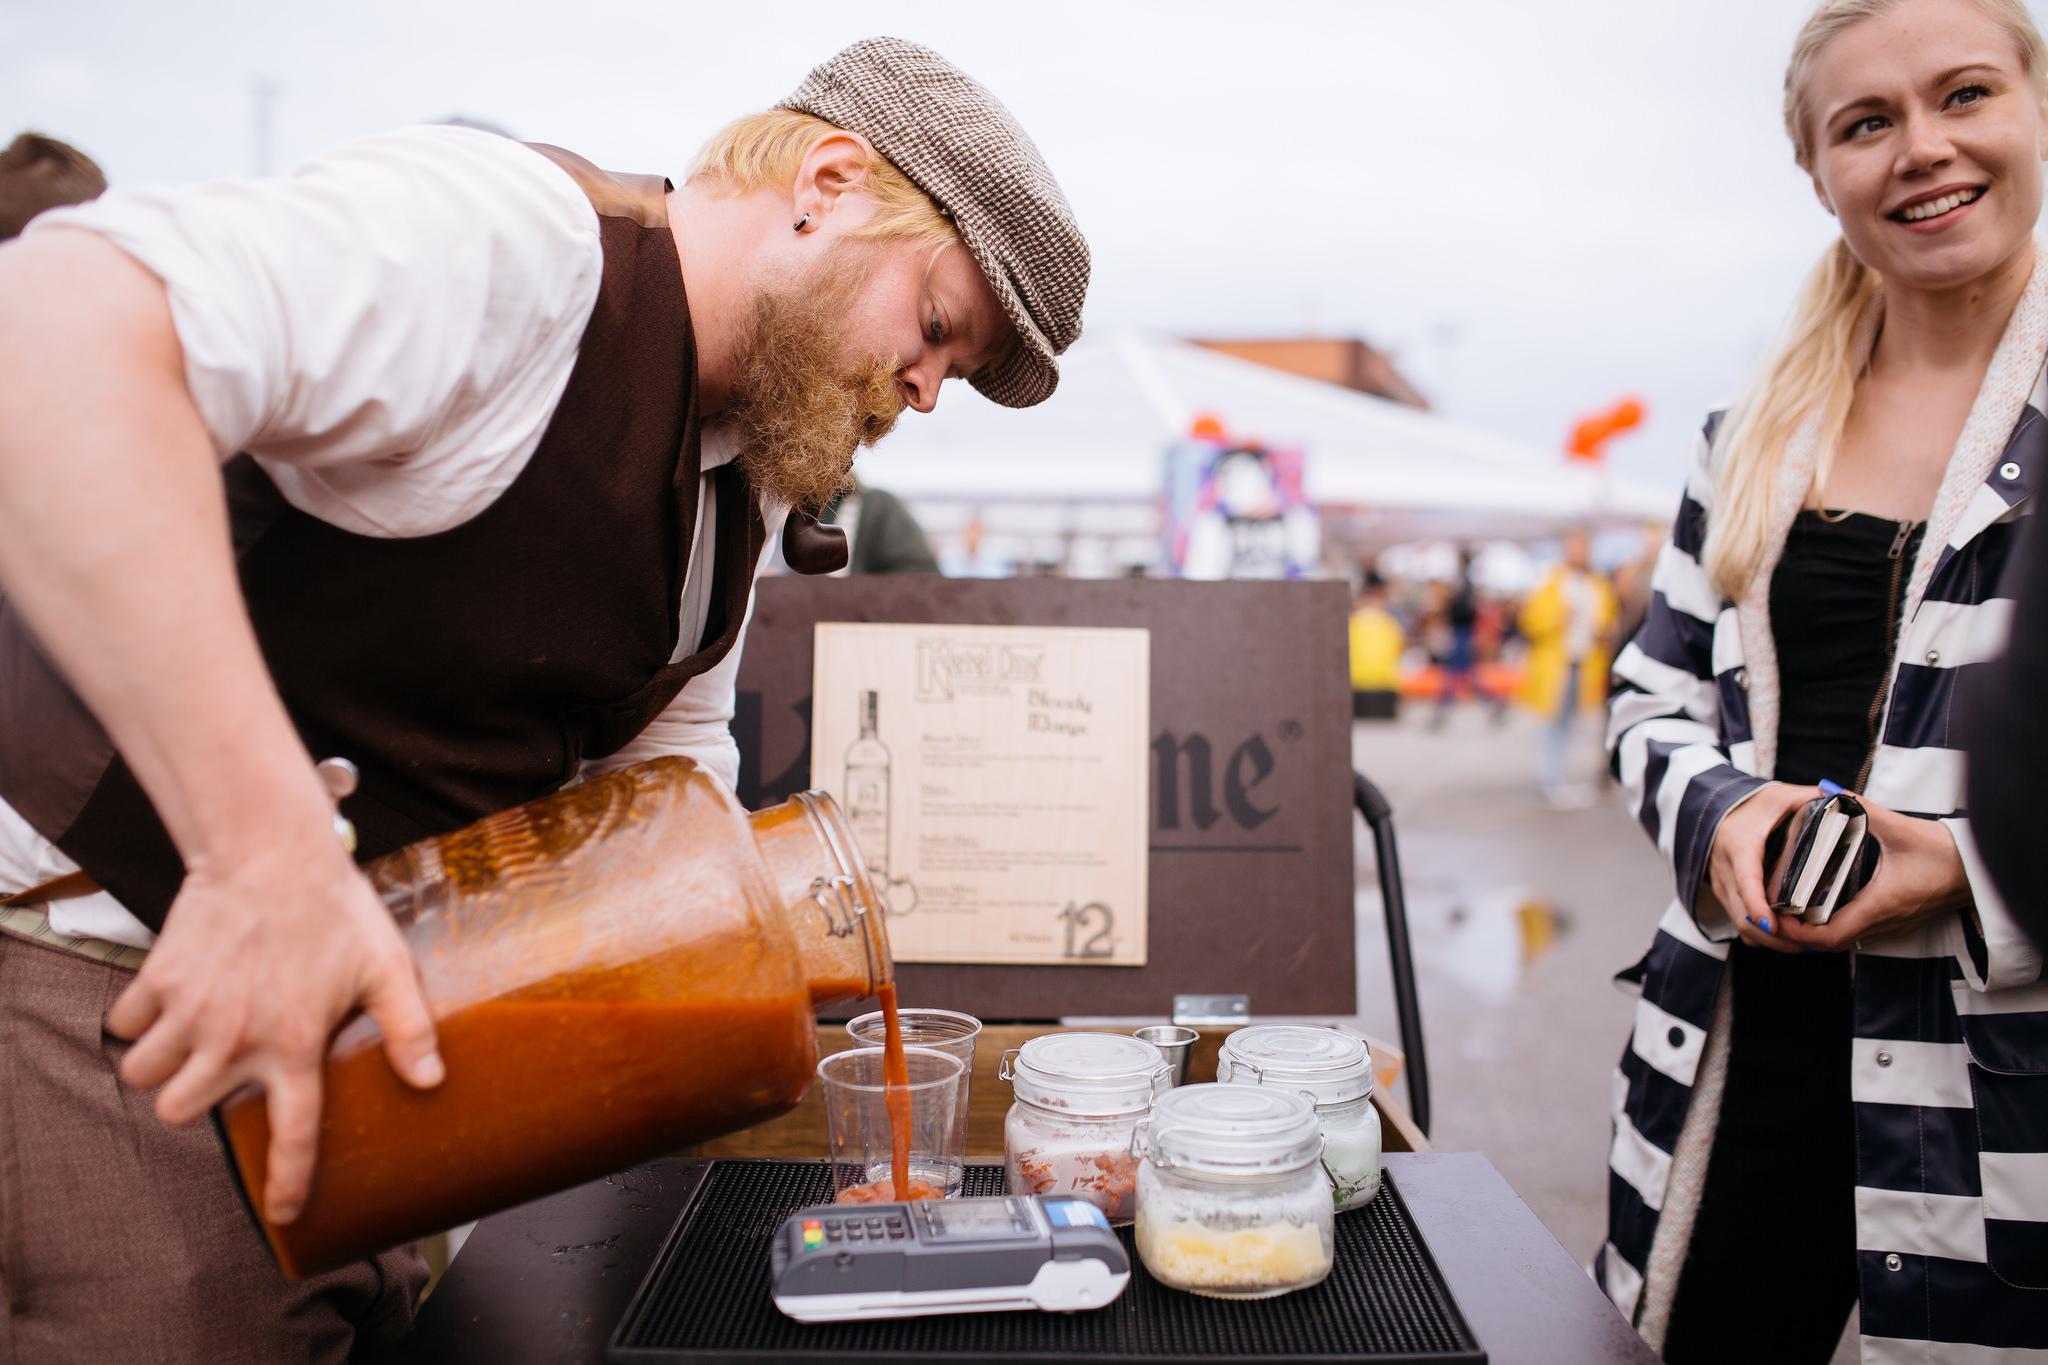 Man pouring artisanal beverage at Flow Festival